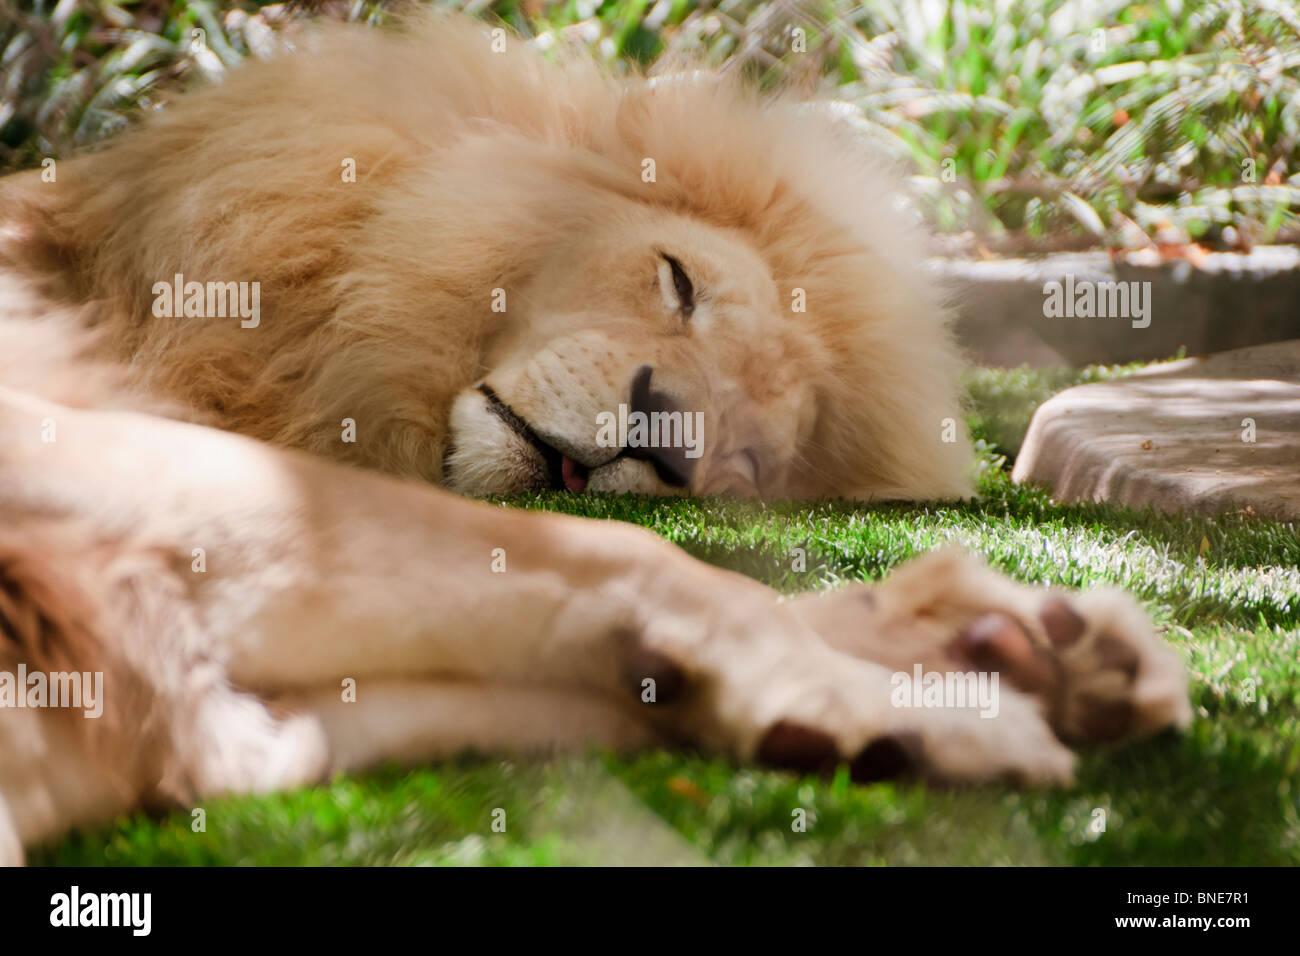 Zoo Vegas Stock Photos & Zoo Vegas Stock Images - Alamy